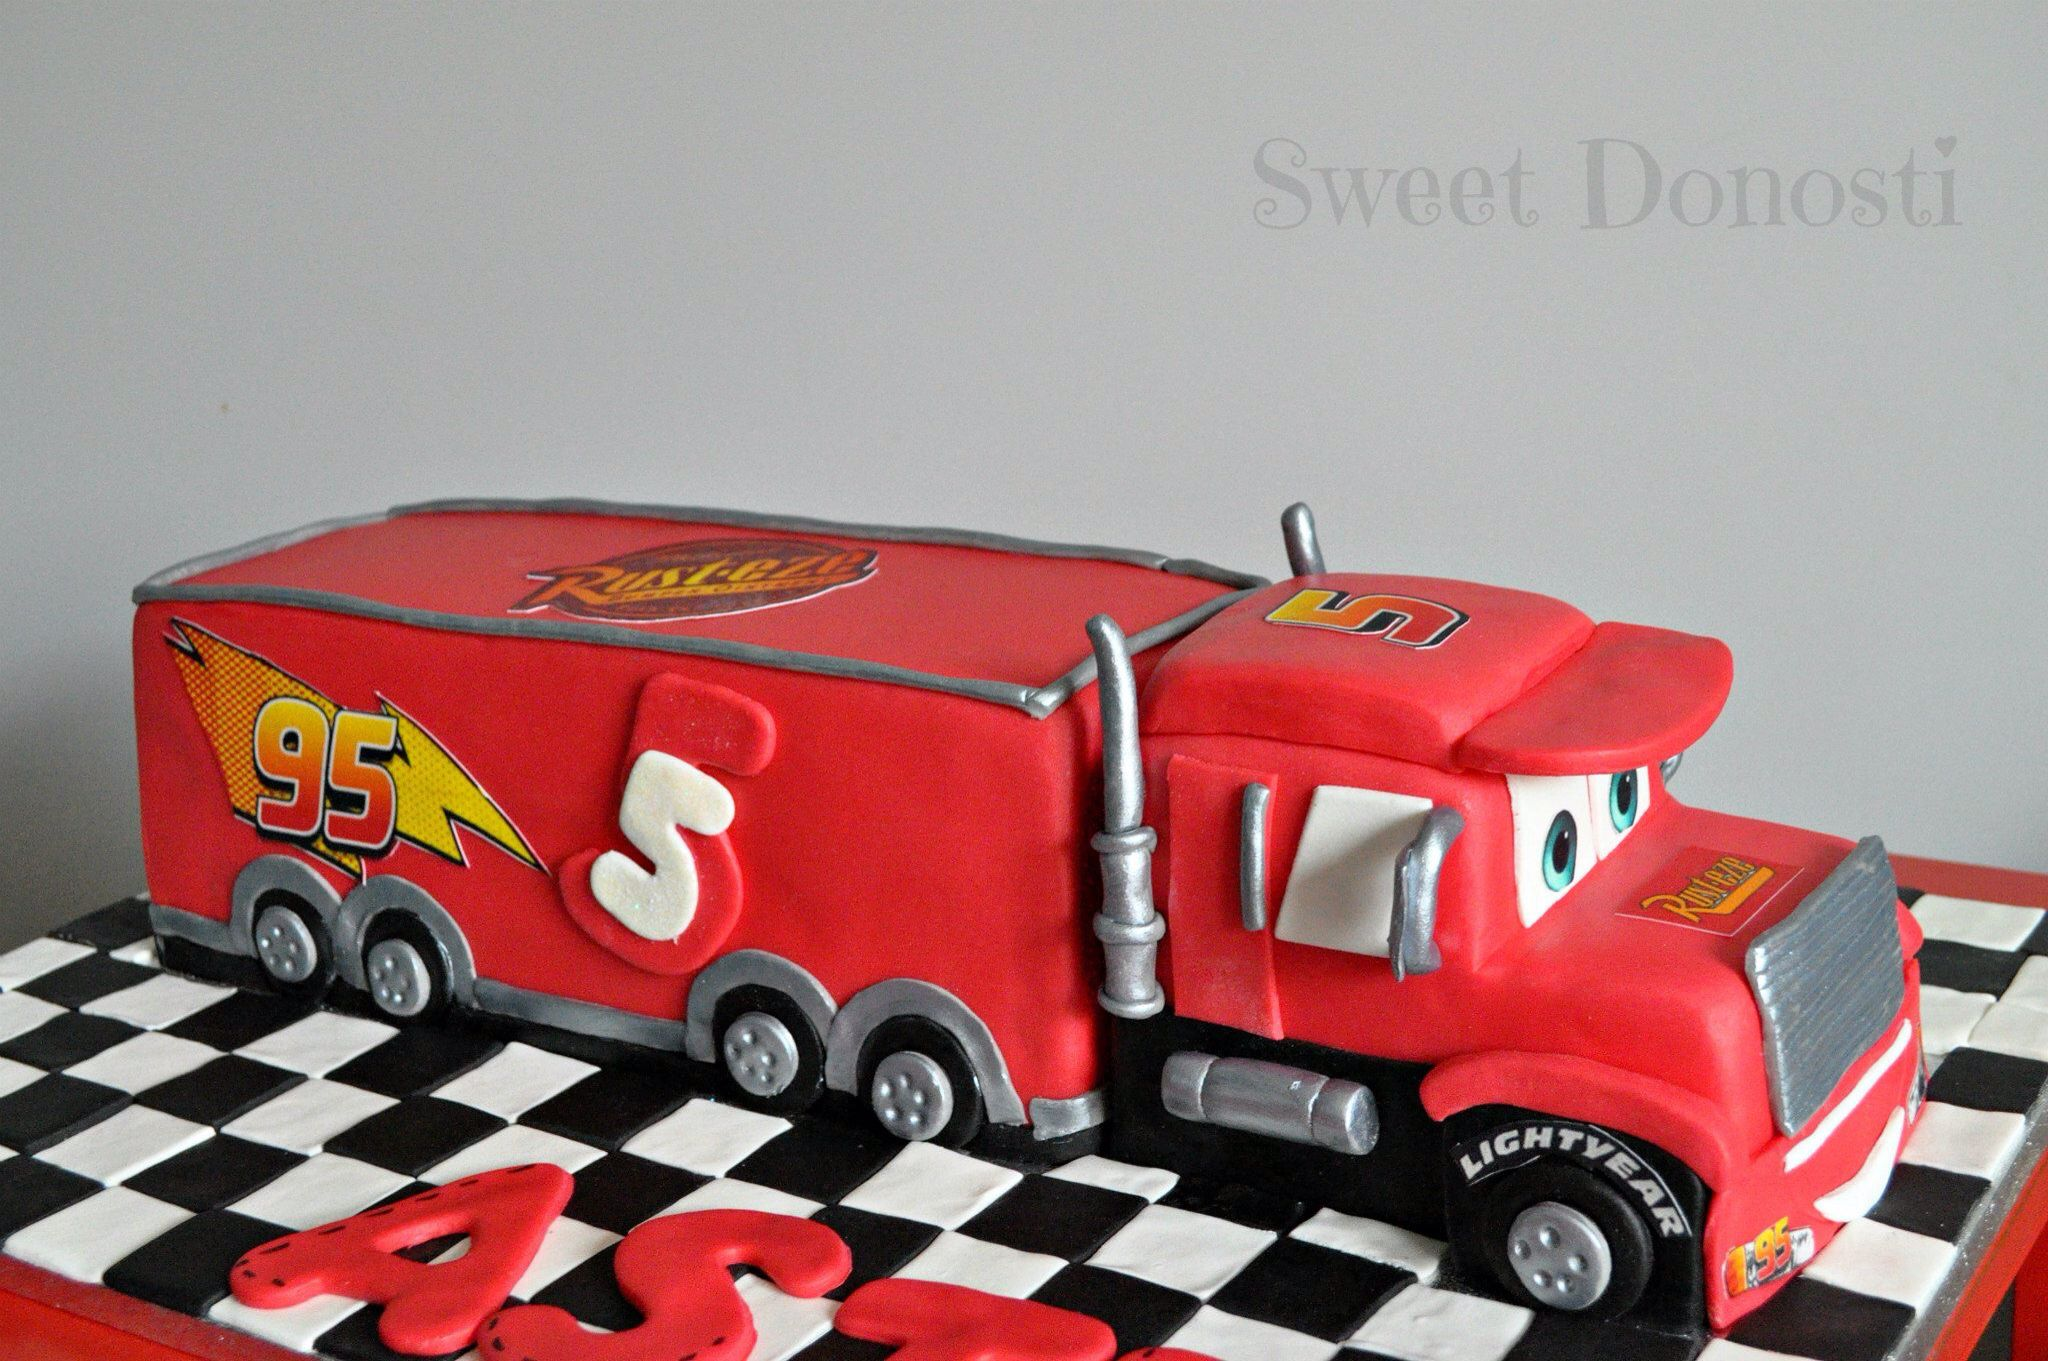 Tarta cami n mack de cars sweet donosti sweet donosti - Cars camion mack ...